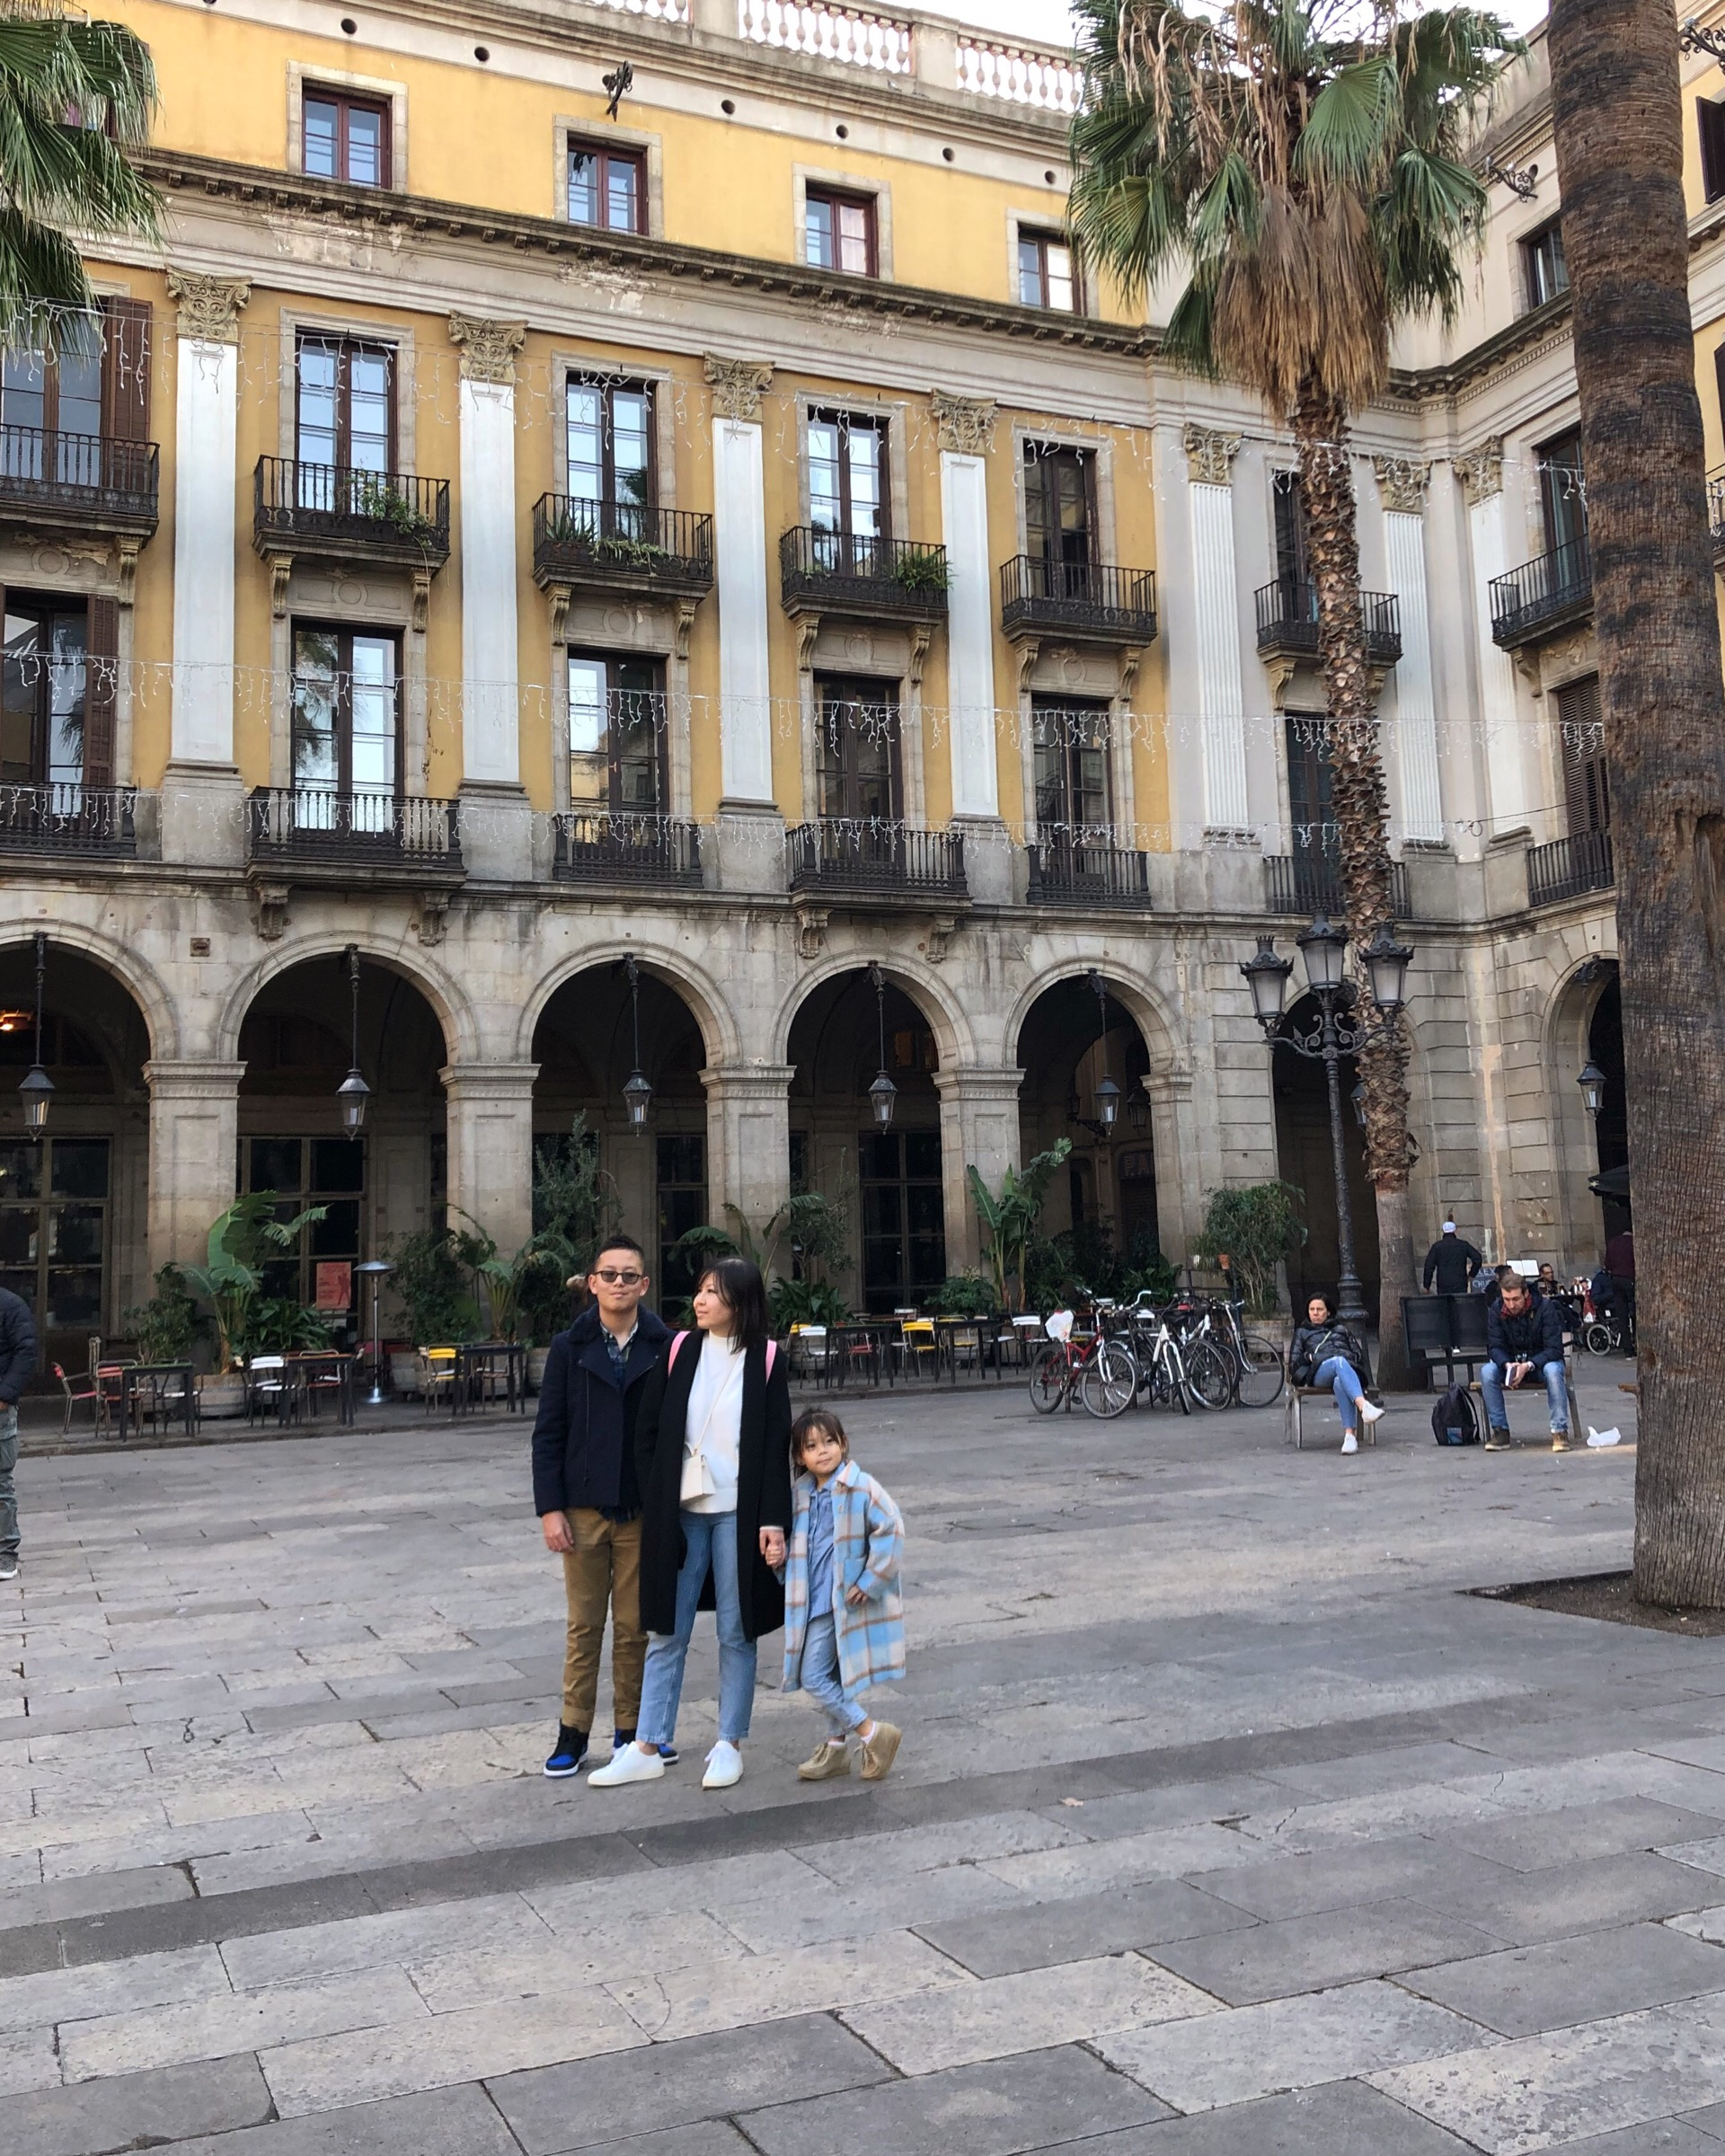 Barcelona with kids on meethaha.com